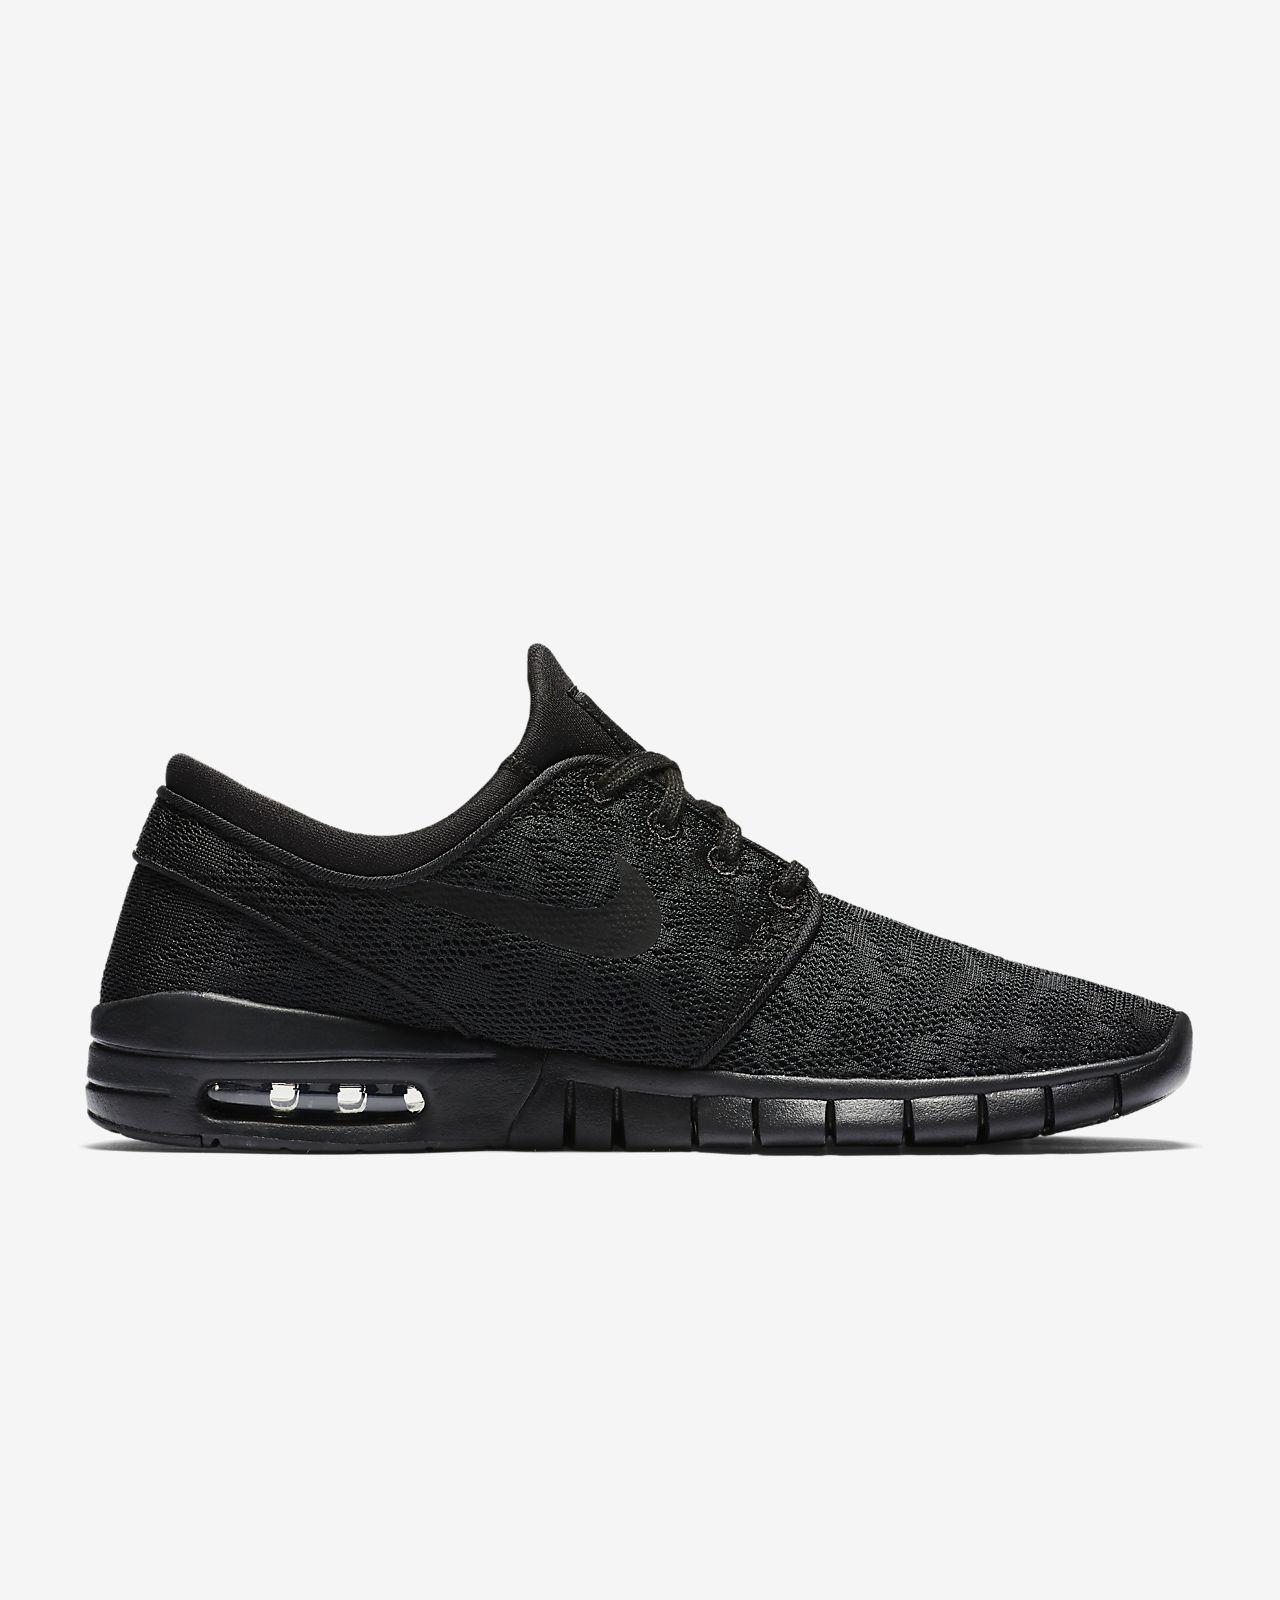 info for 34980 f40c0 ... Nike SB Stefan Janoski Max Skate Shoe